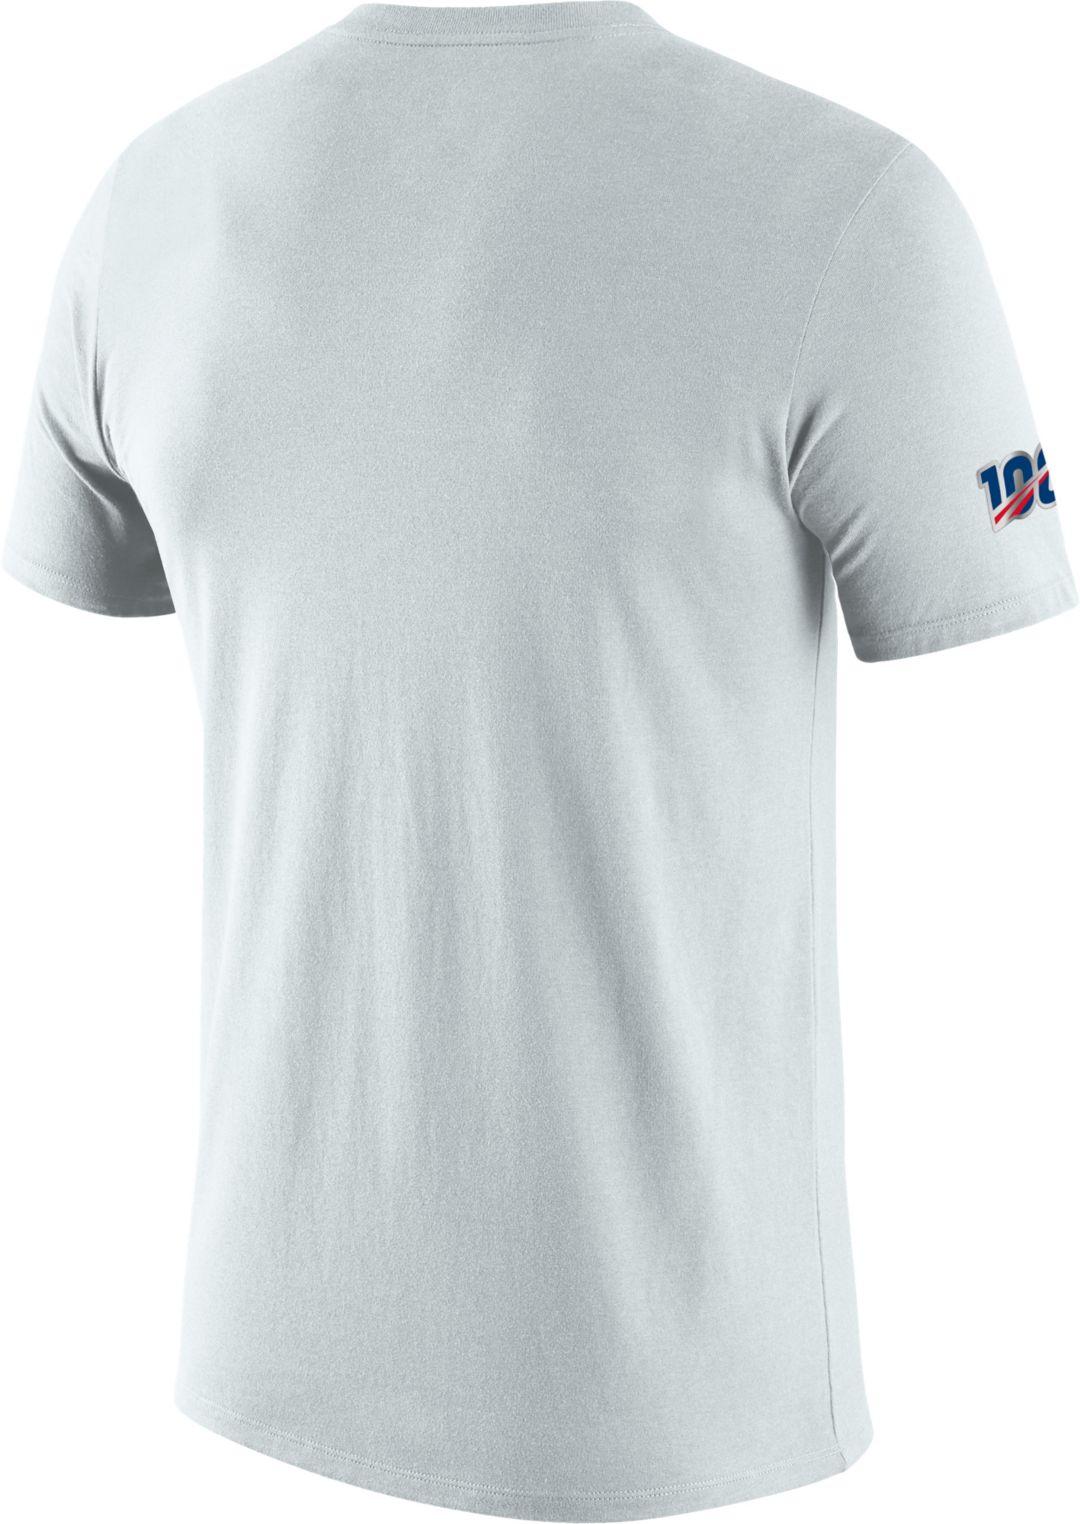 reputable site 498b8 eaec3 Nike Men's Baltimore Ravens 100th Sideline Legend Performance White T-Shirt